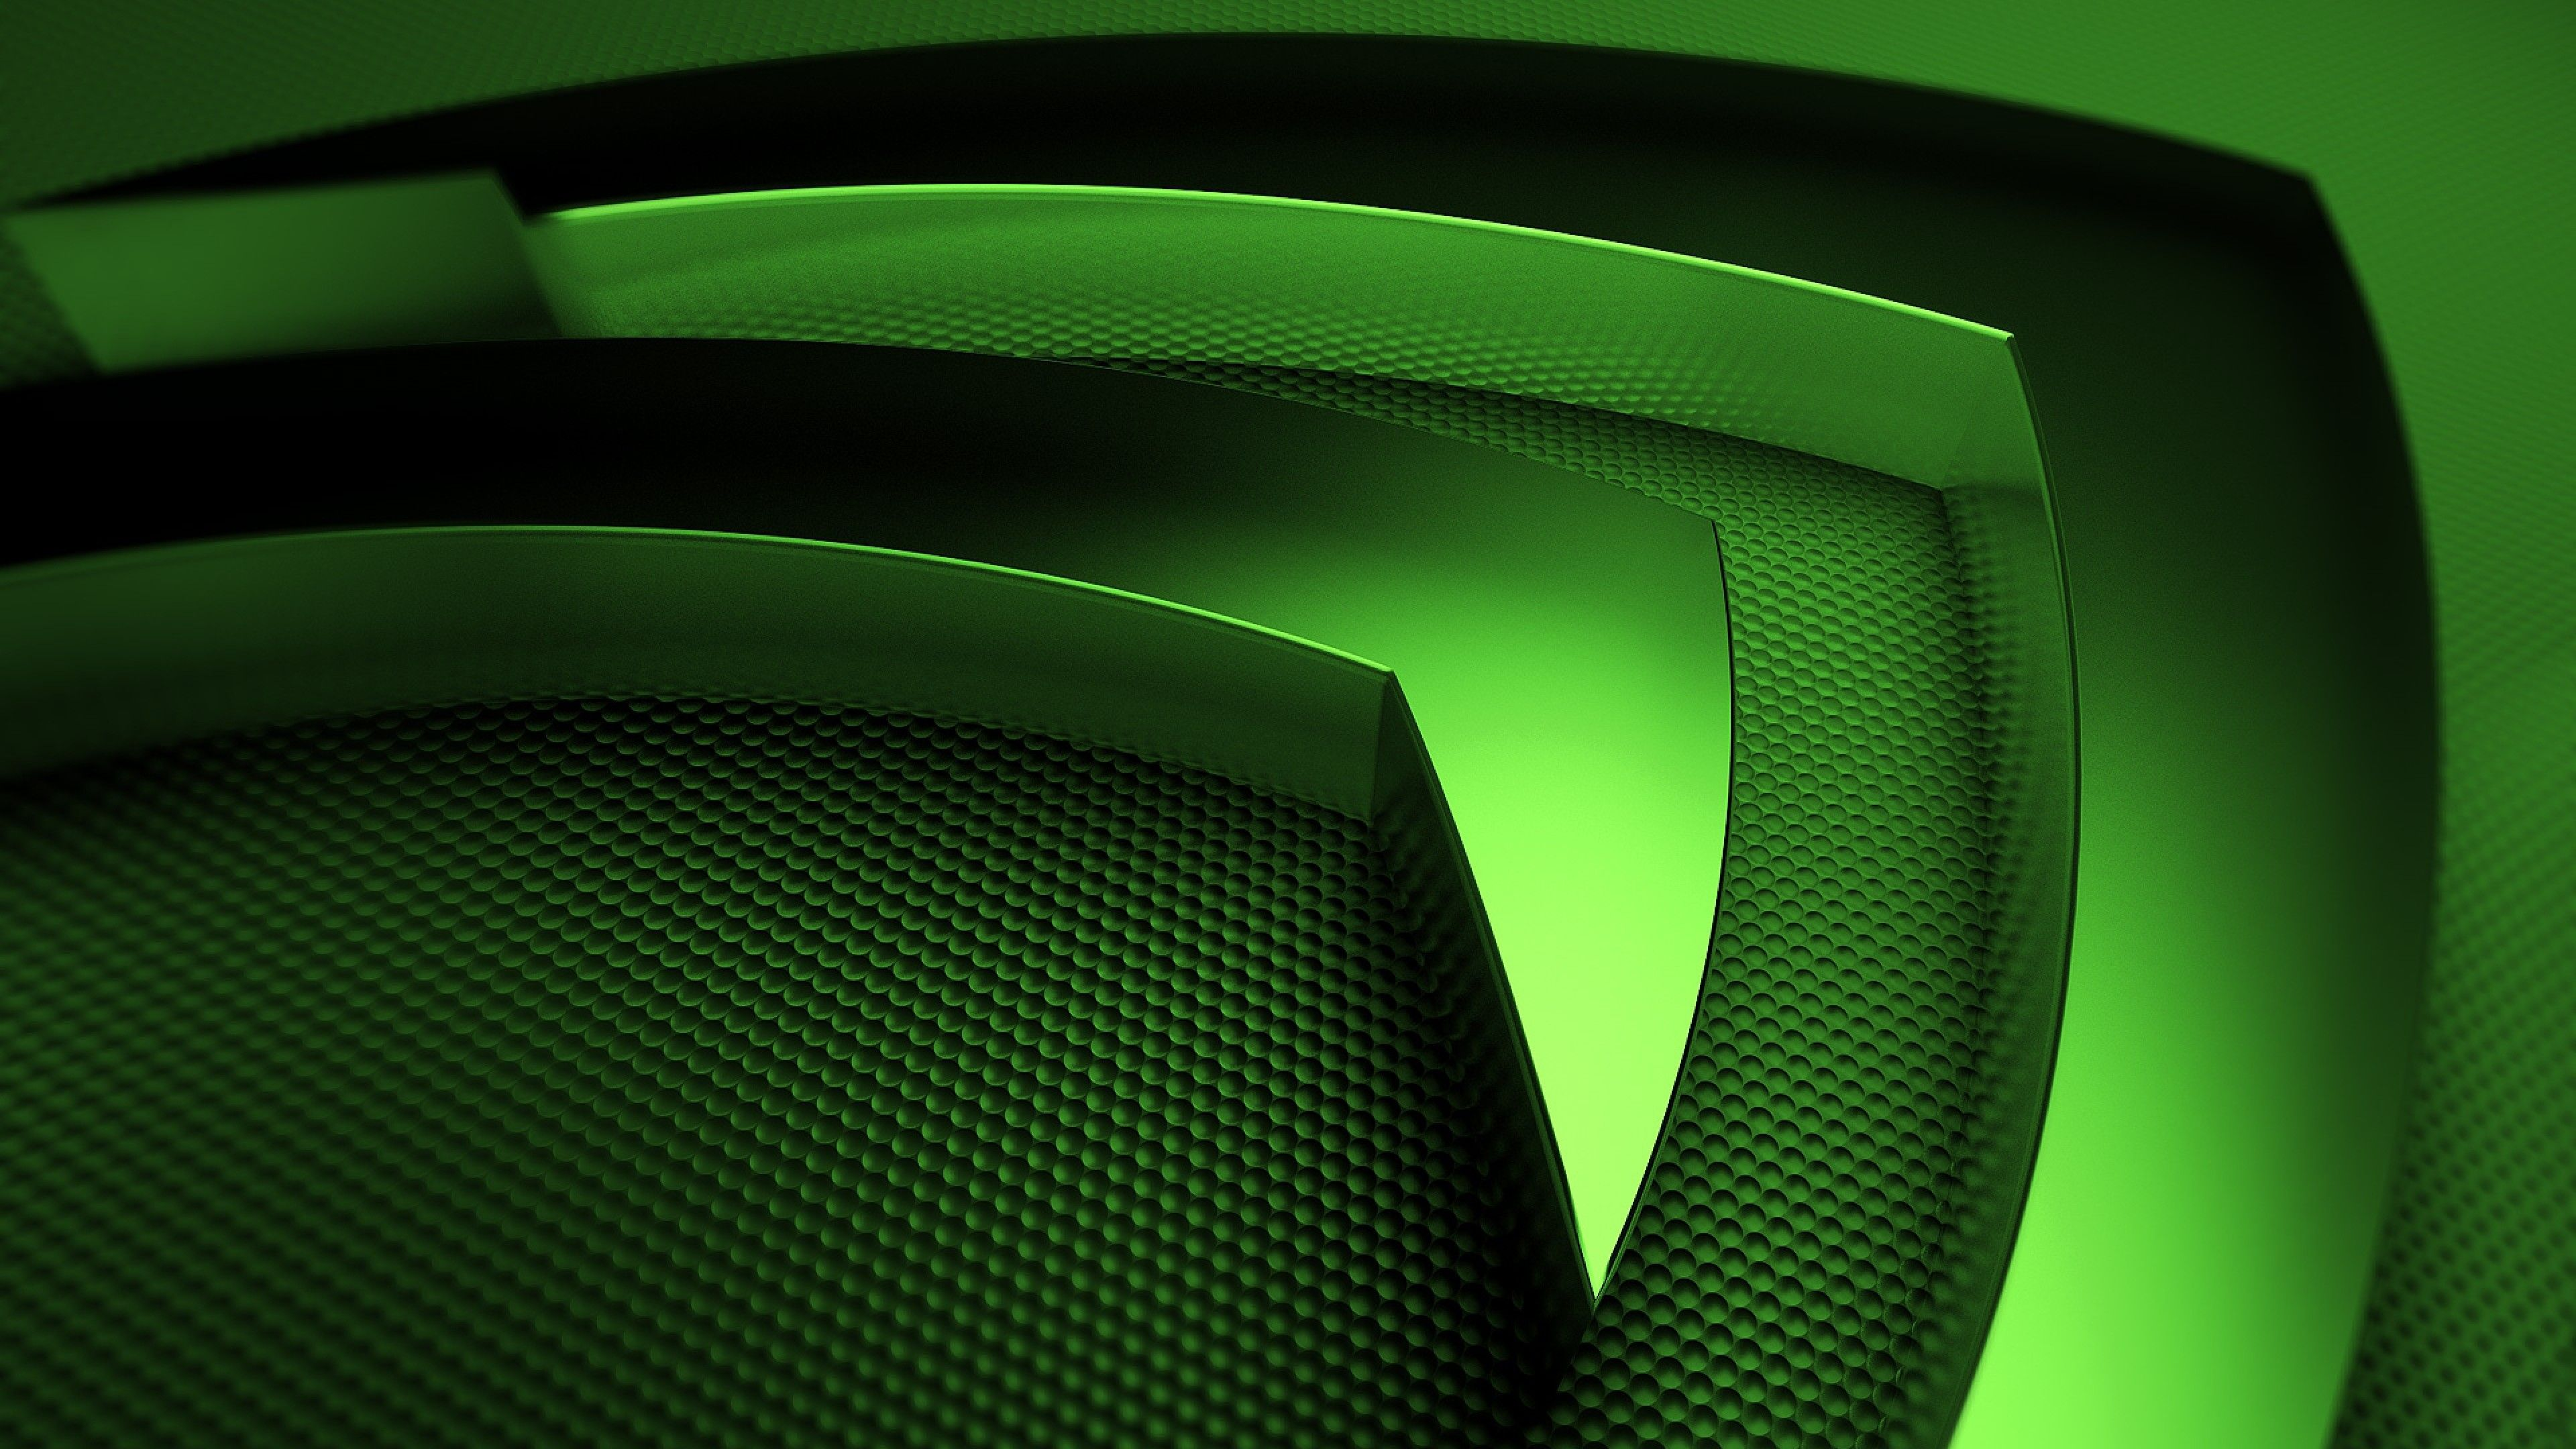 cinema 4d background image